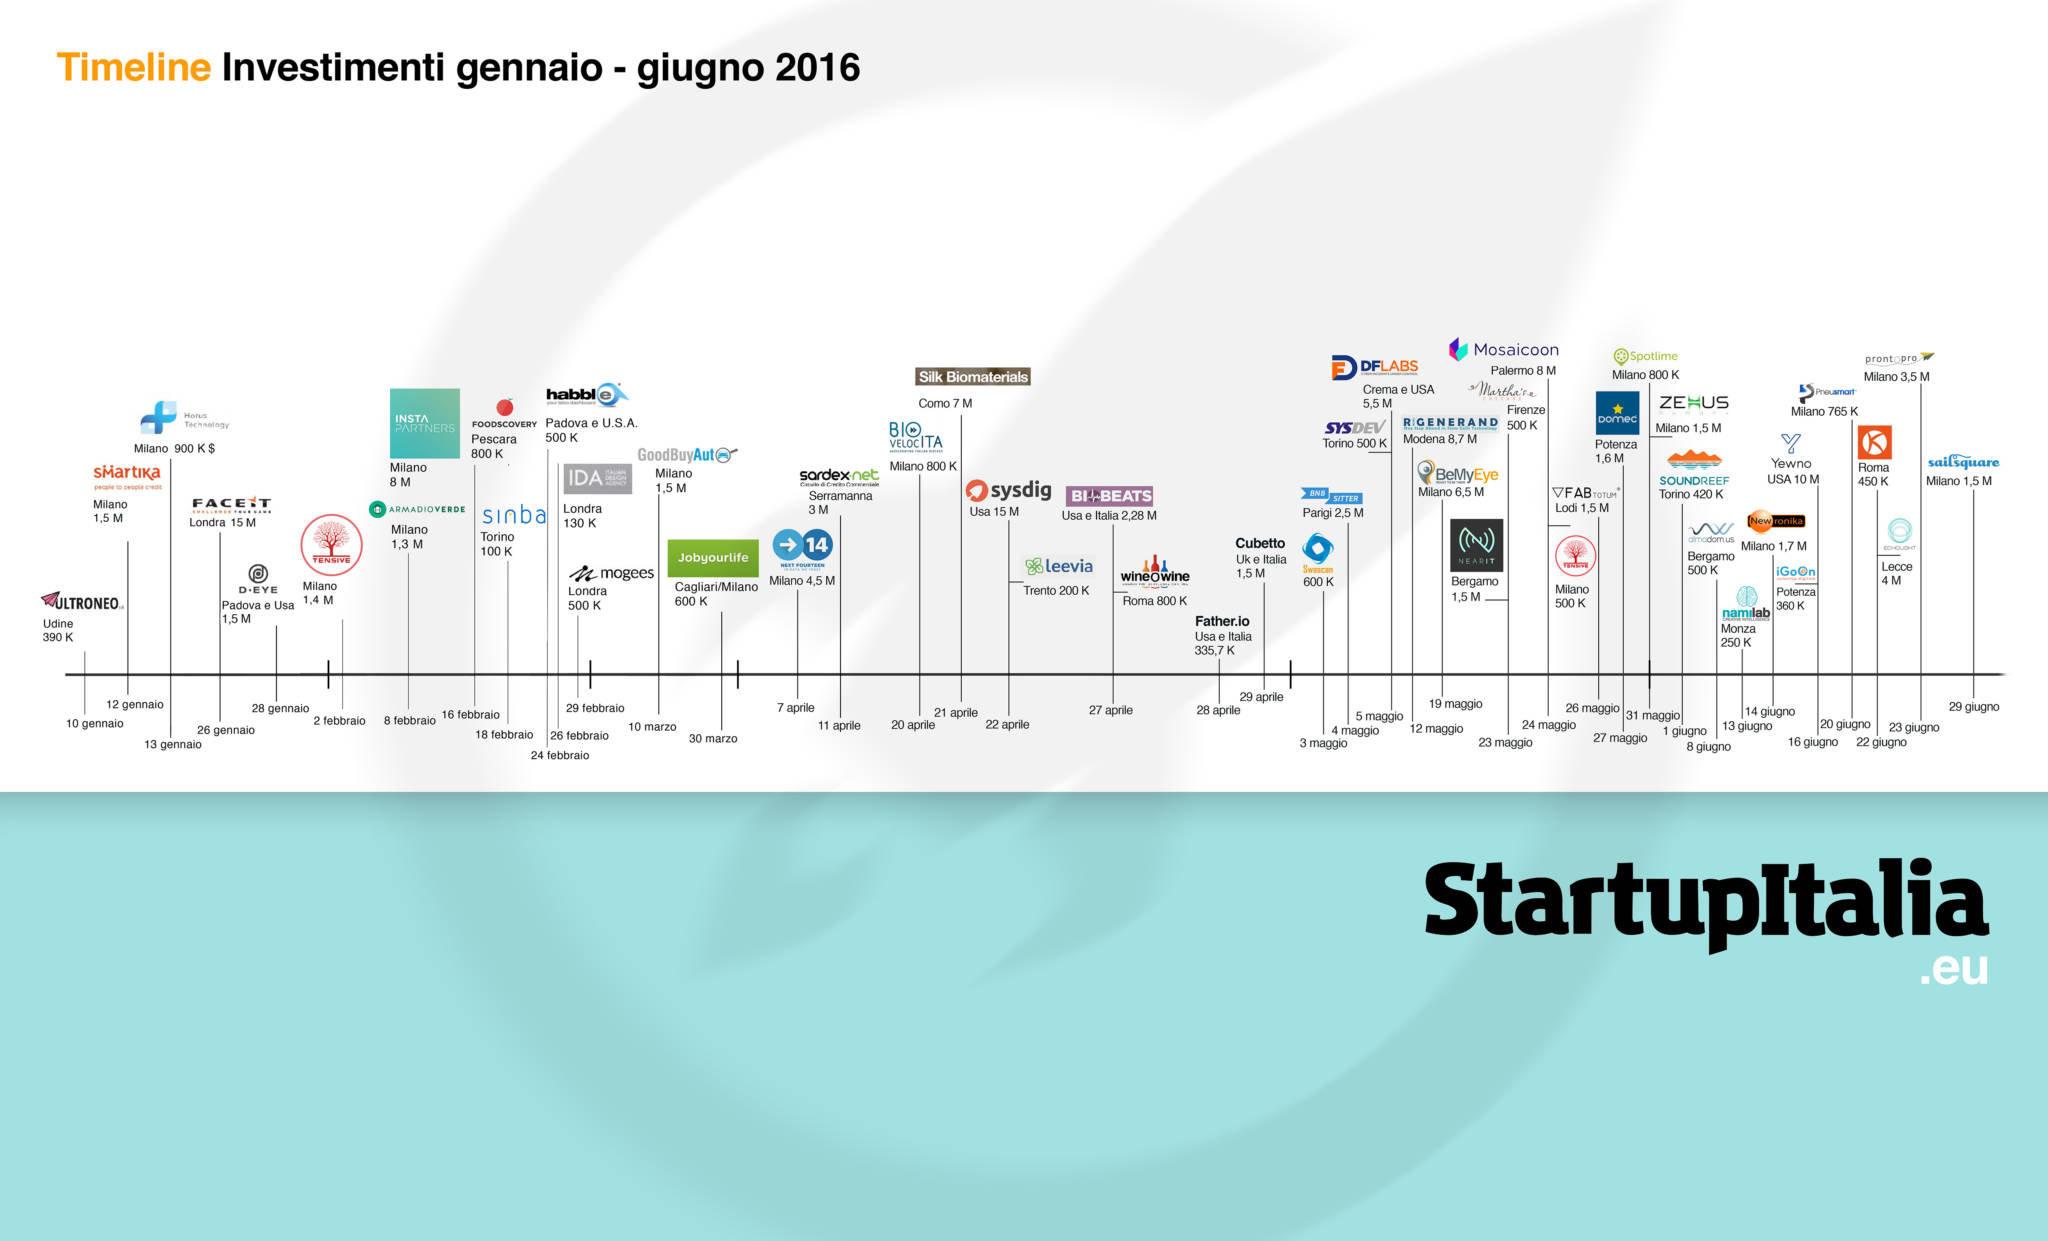 Timeline investimenti 2016